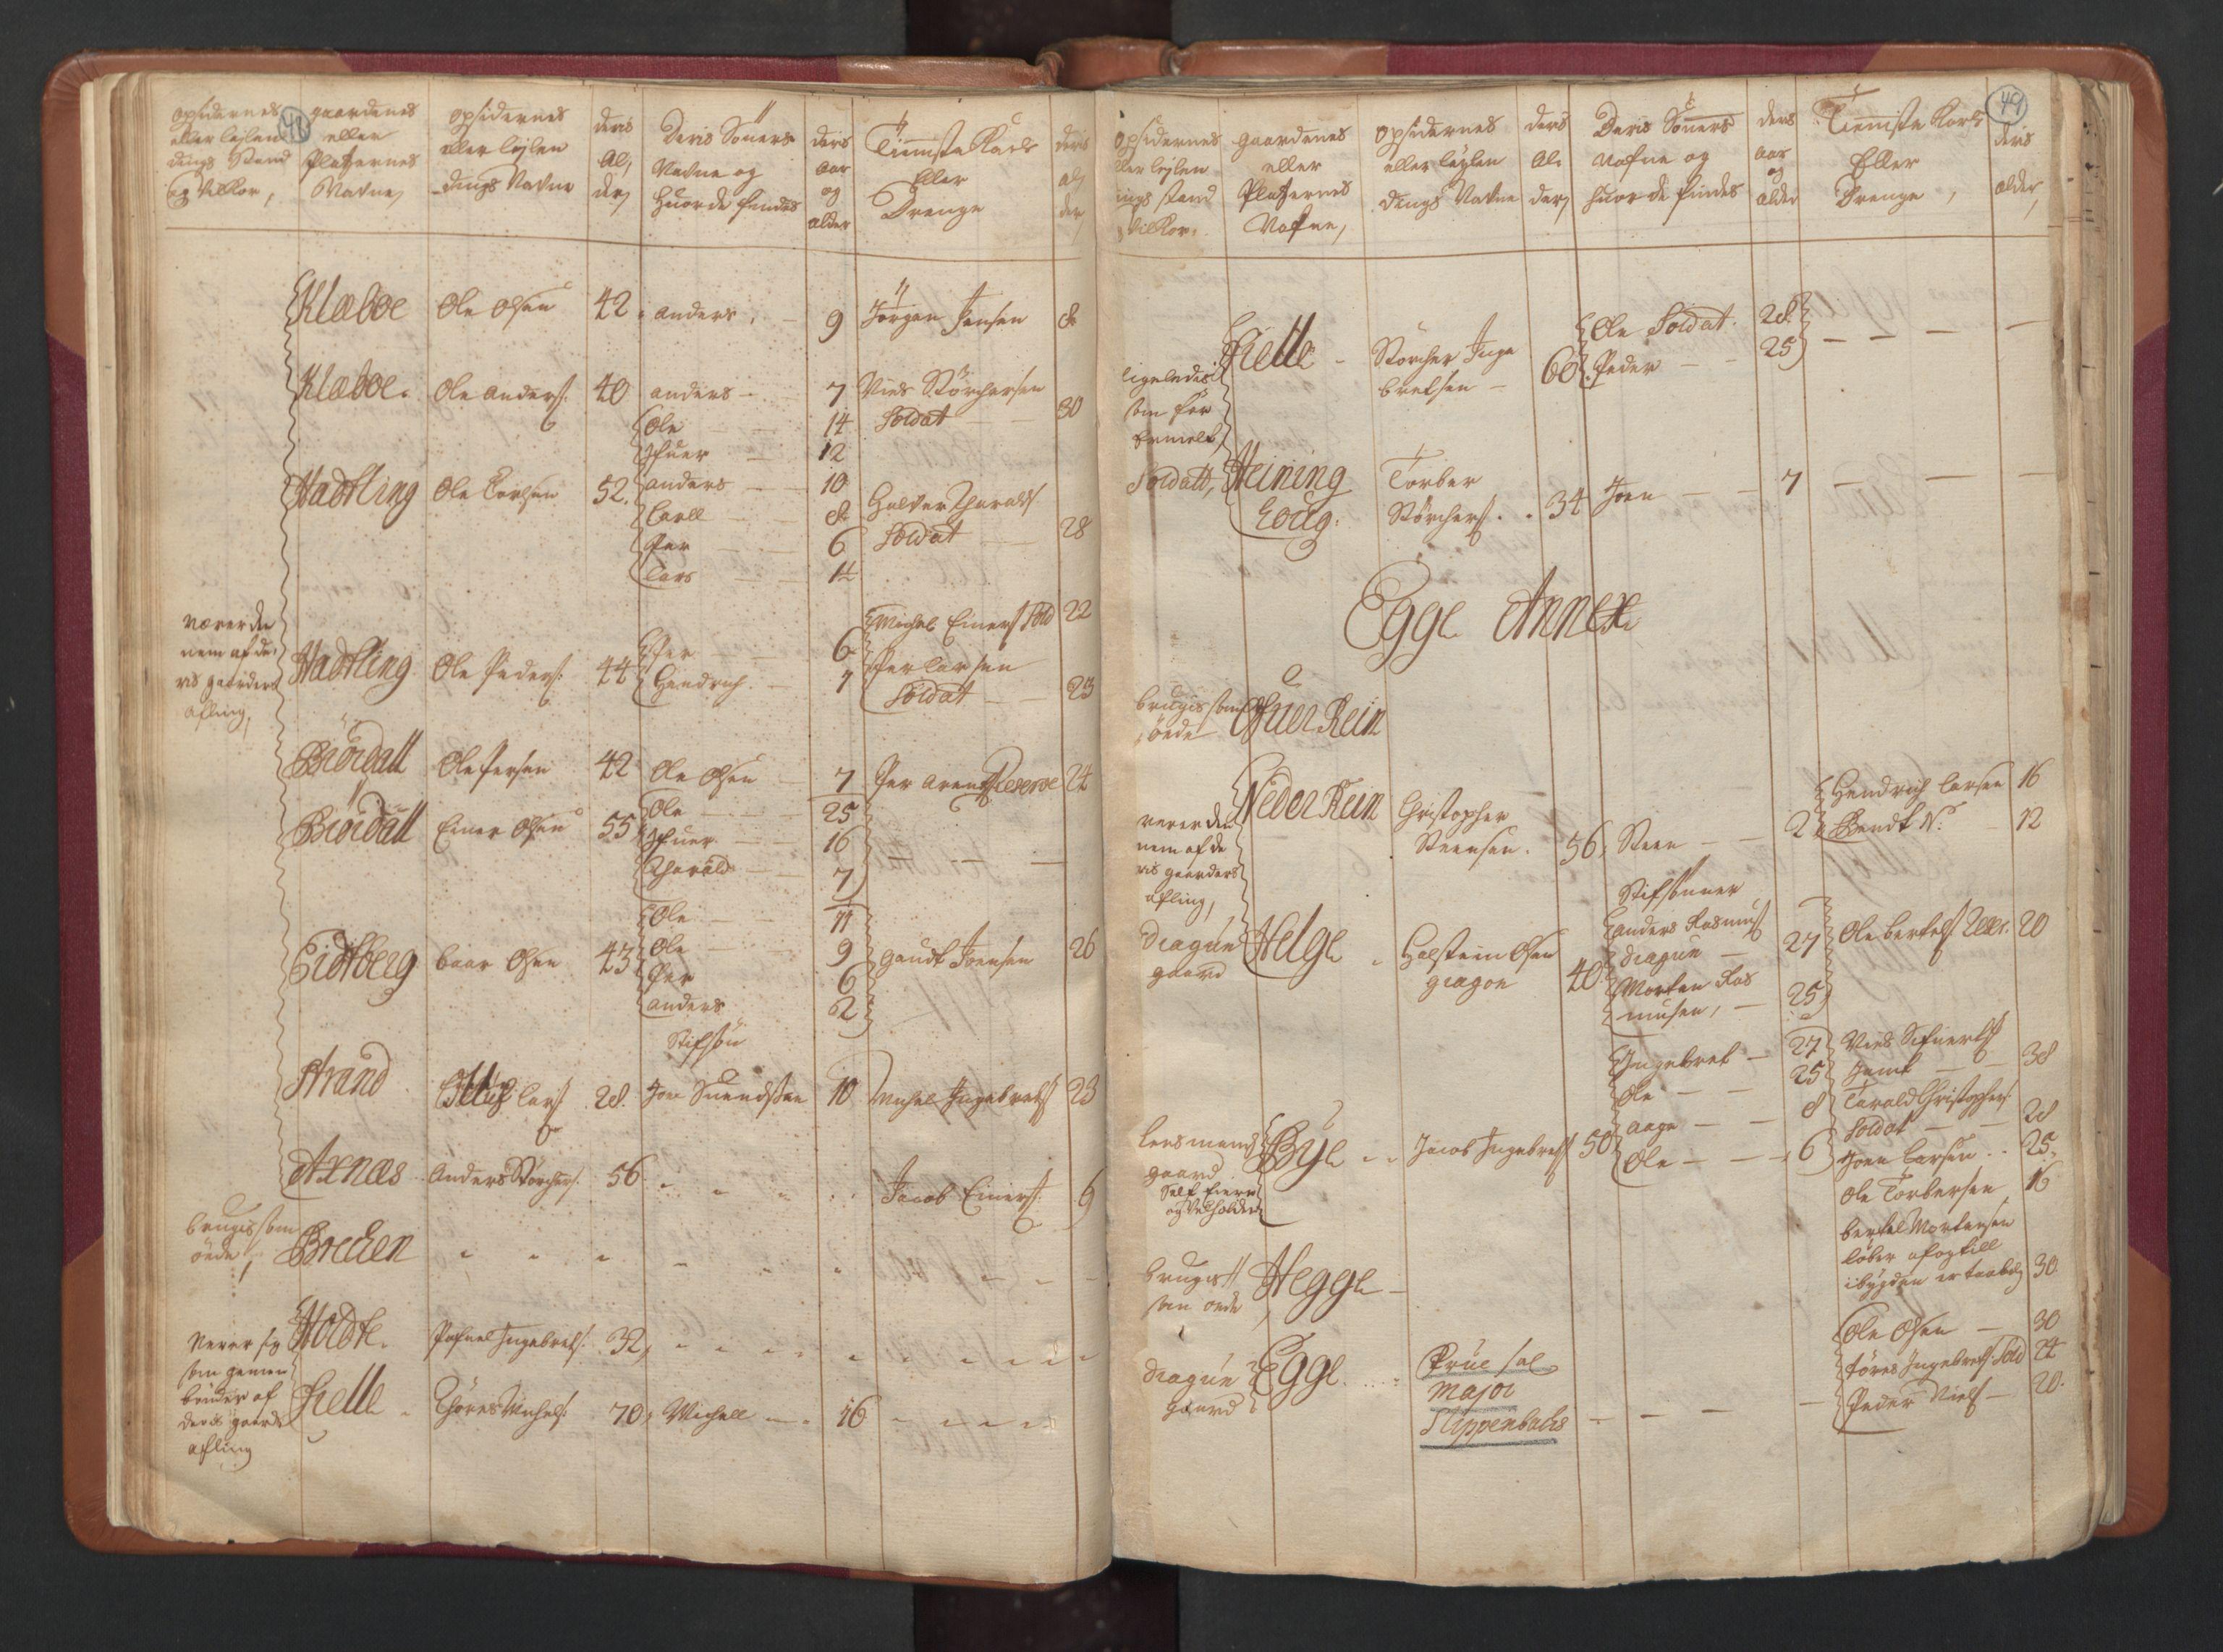 RA, Manntallet 1701, nr. 15: Inderøy fogderi og Namdal fogderi, 1701, s. 48-49